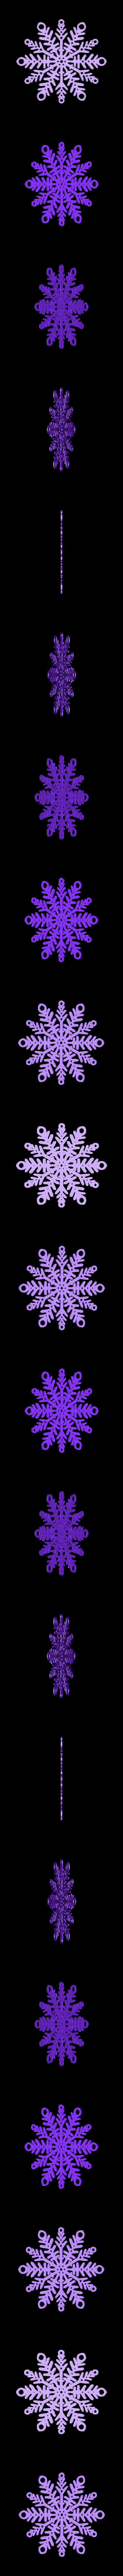 etoile_antartica_v1-01.STL Download STL file Decoration to hang or to pose Etoile Antartica • 3D printing object, Tibe-Design